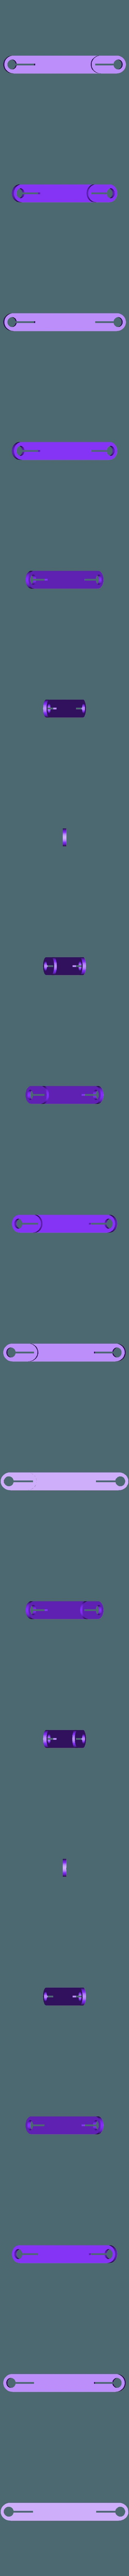 7cm_Strap_Holes.stl Download free STL file Flexible Filament Bikini Top and Bottom • 3D printable design, SexyCyborg